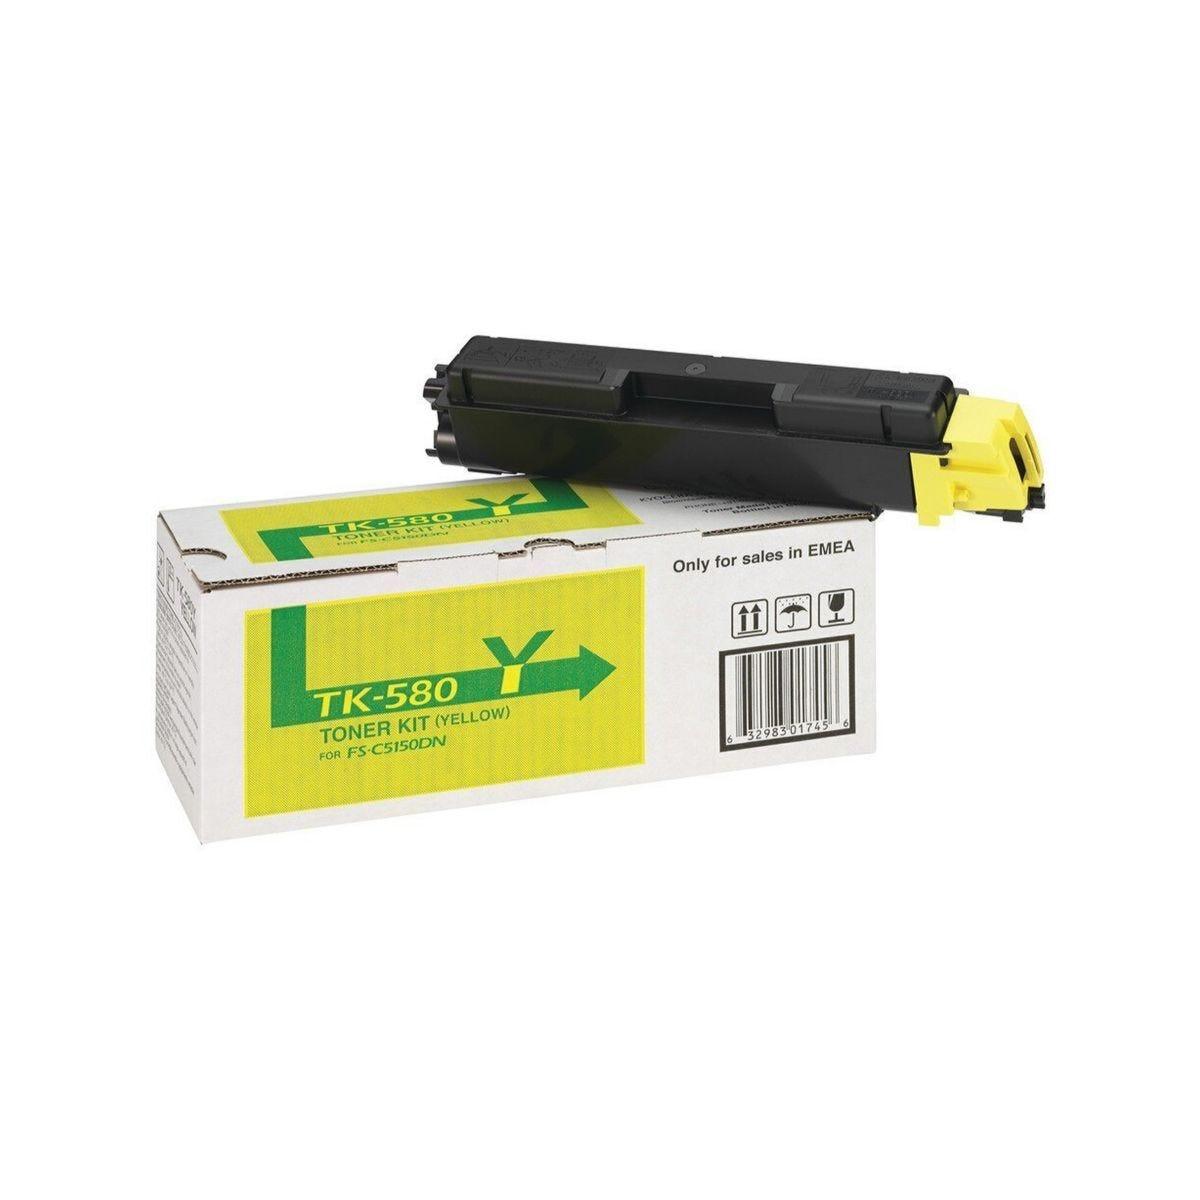 Kyocera FS-C5150DN Toner Yellow